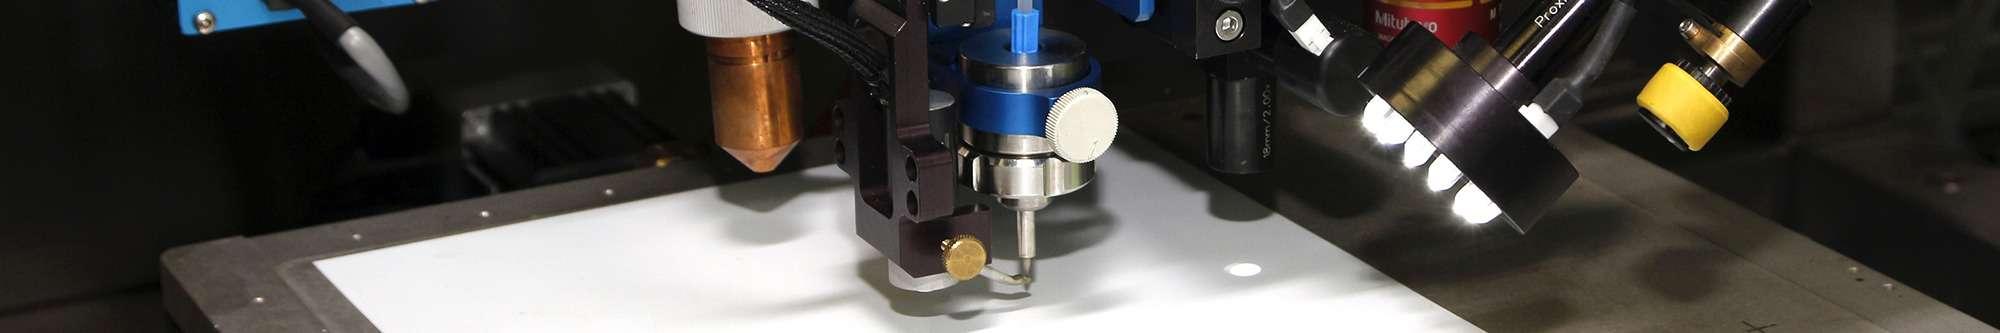 plasmabrplasmabrush PB3 Aerosol Jet Printerush PB3 Aerosol Jet Printer